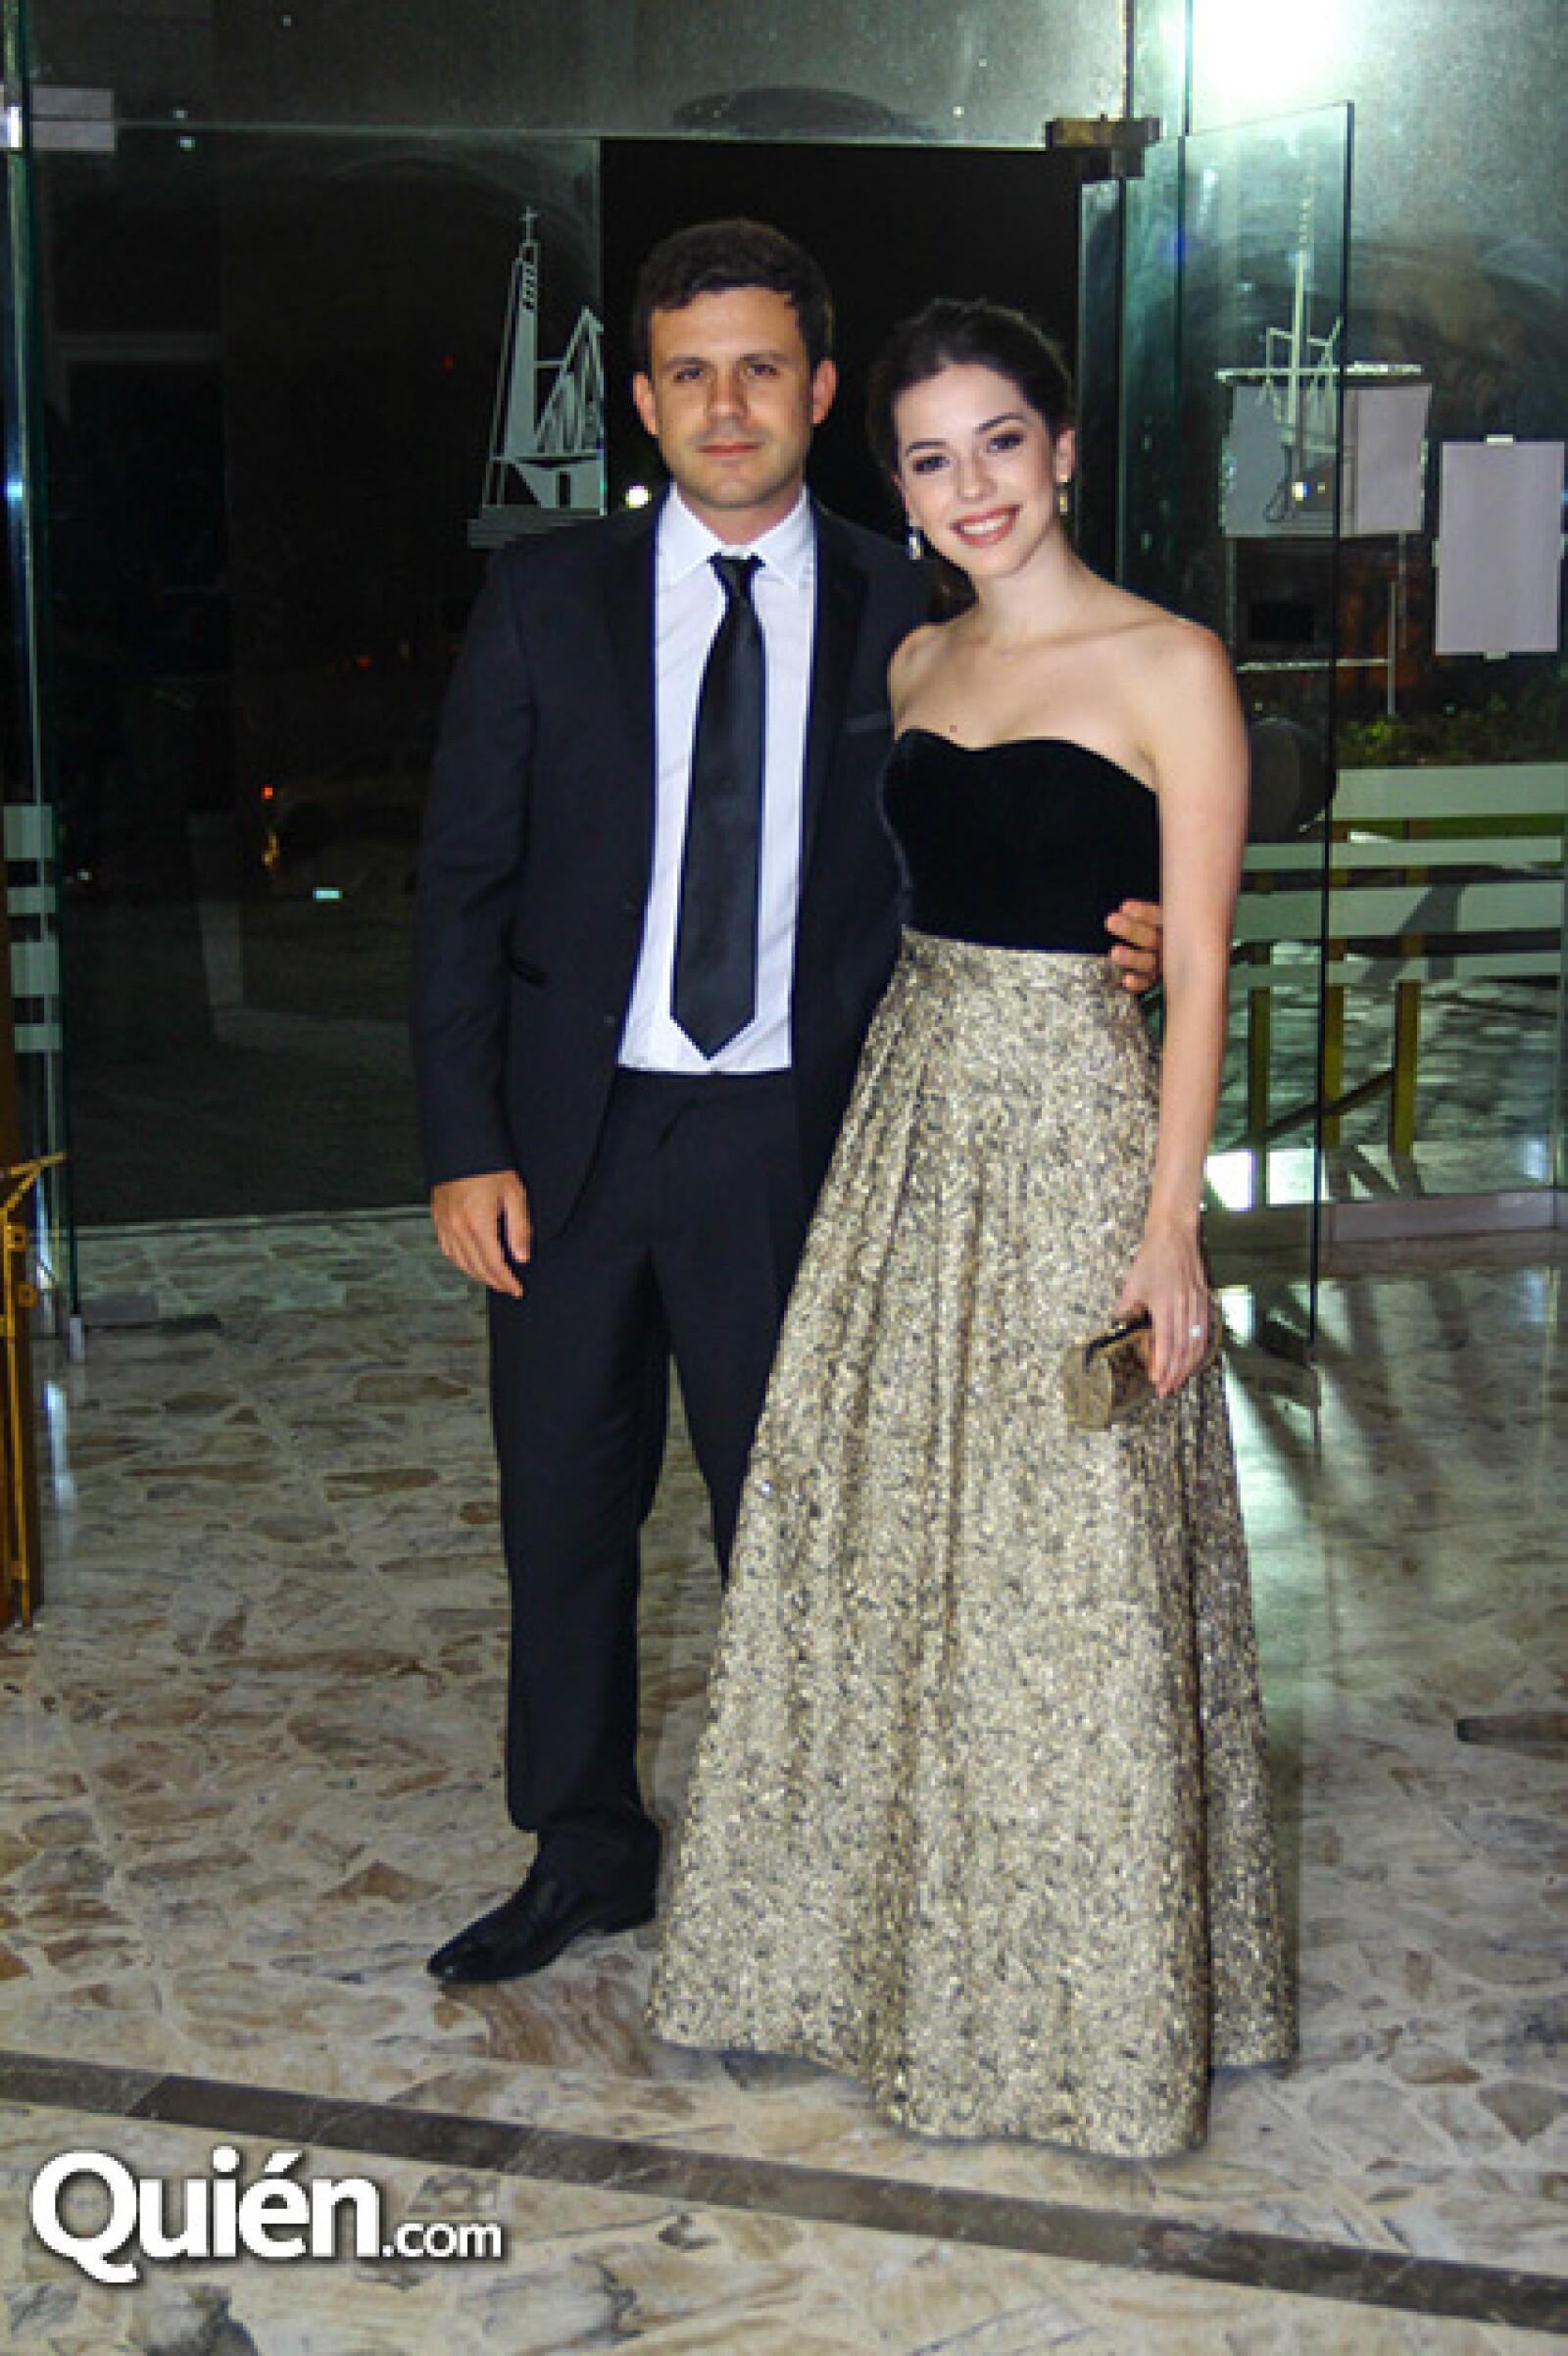 Fernando Sada y Graciela Arechavaleta